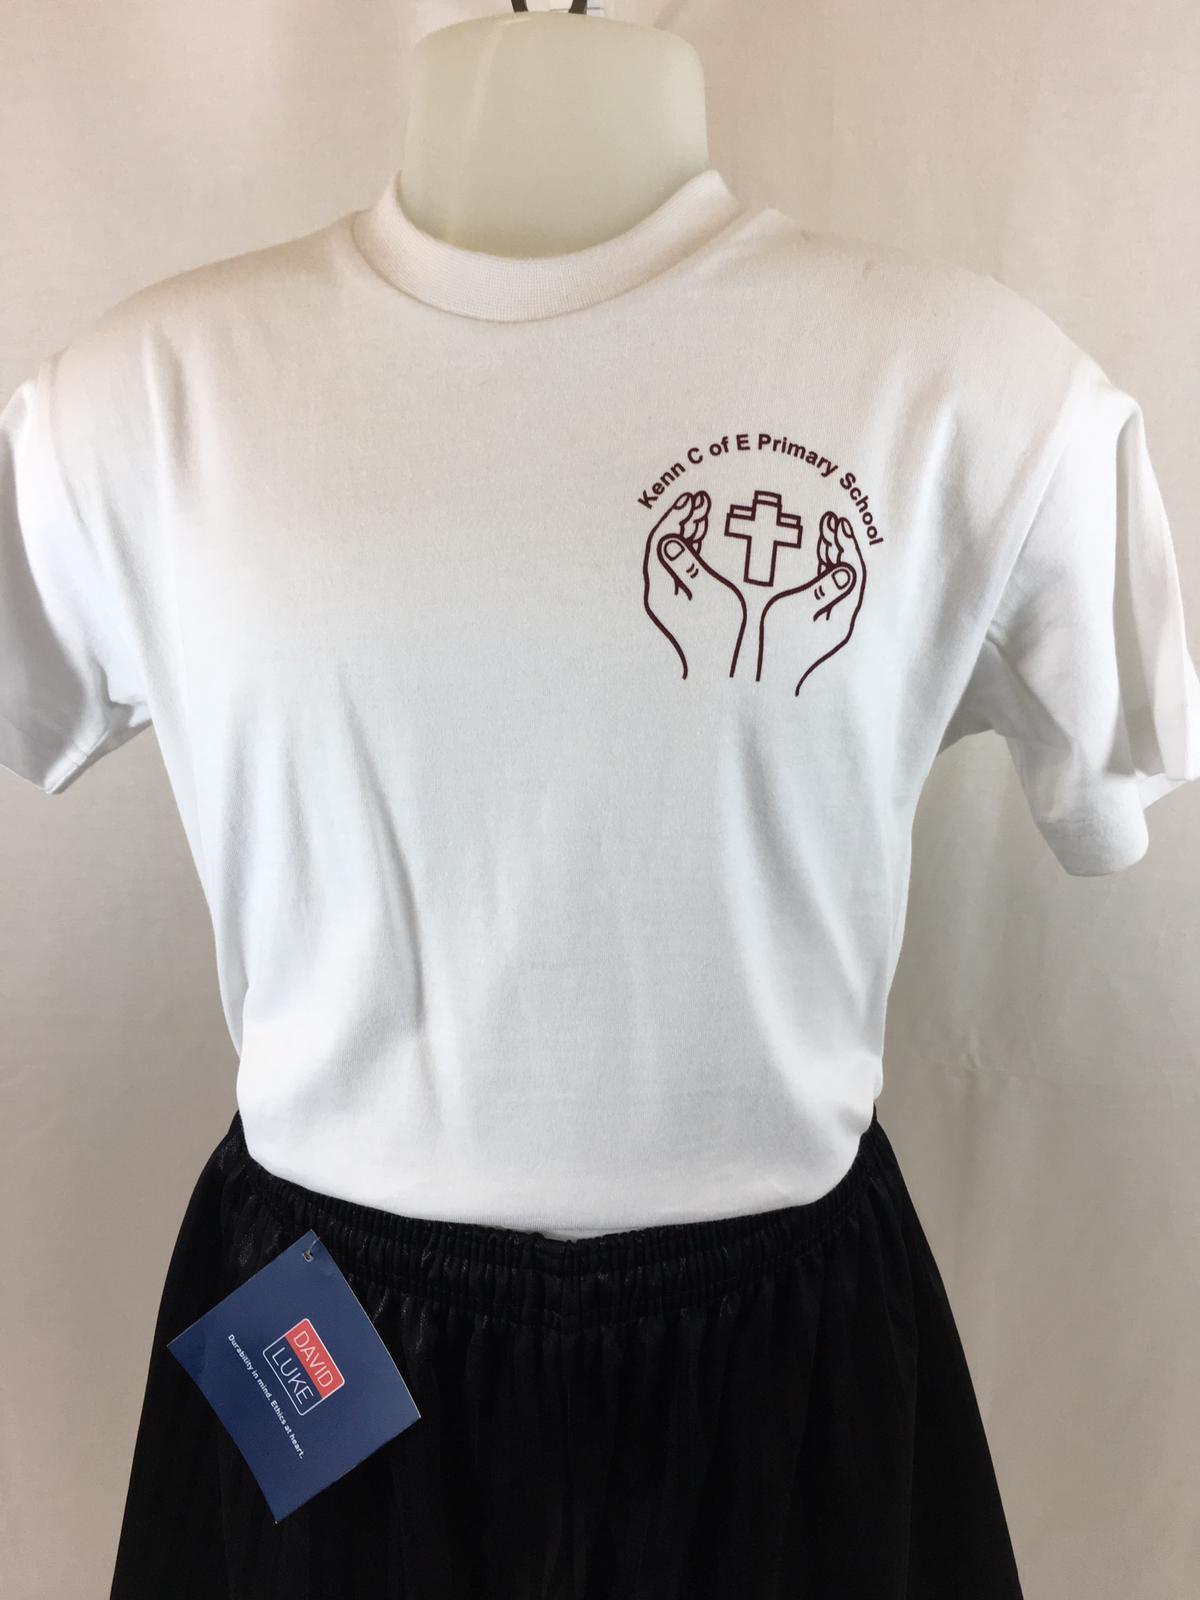 Kenn Primary School PE T Shirt